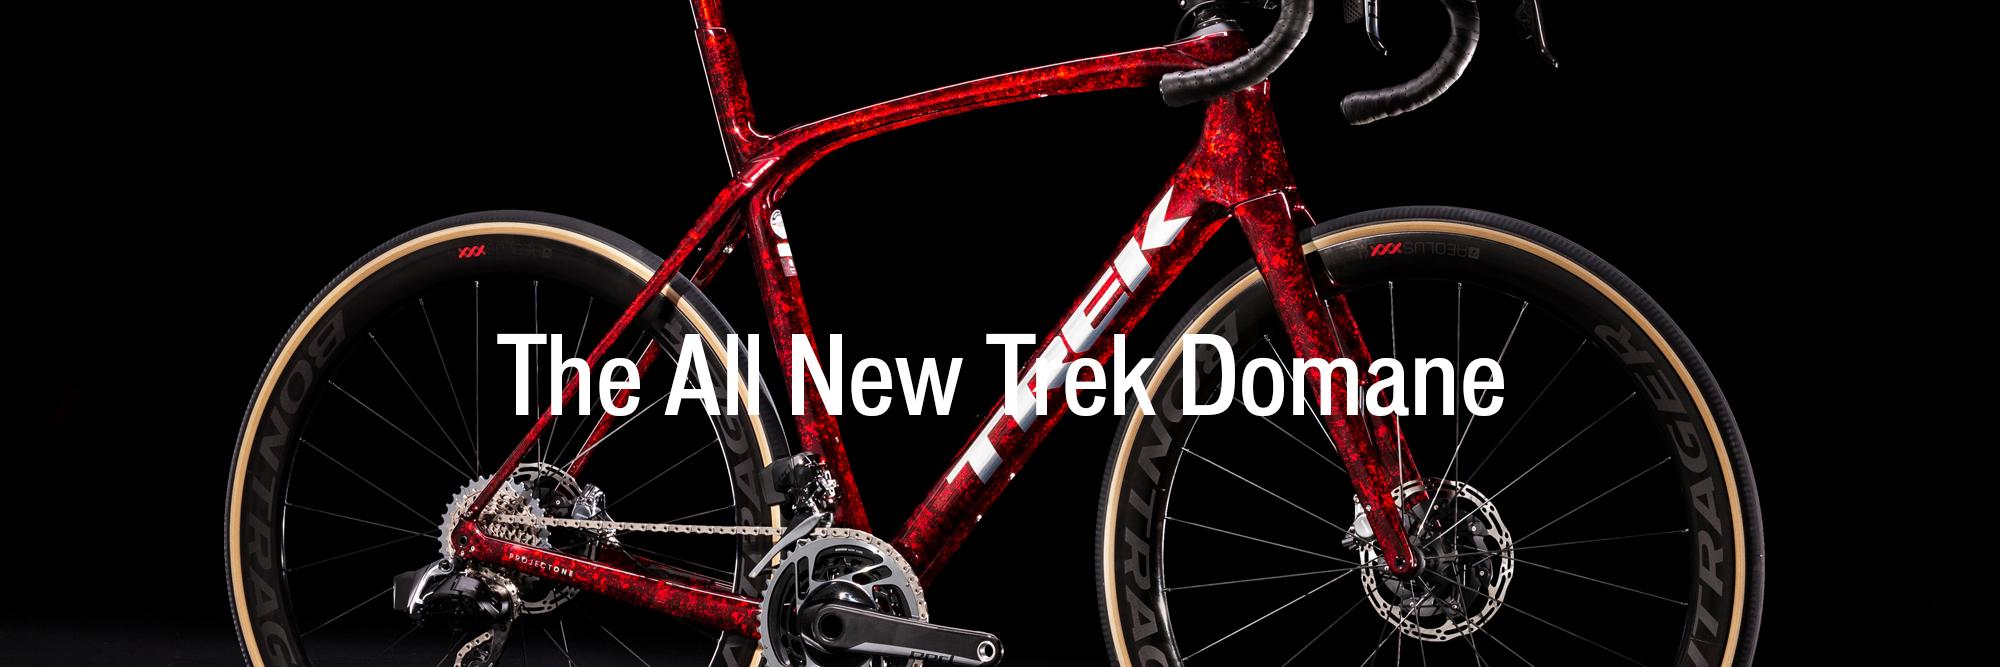 The All-New Trek Domane at Spark Bike Run Sports